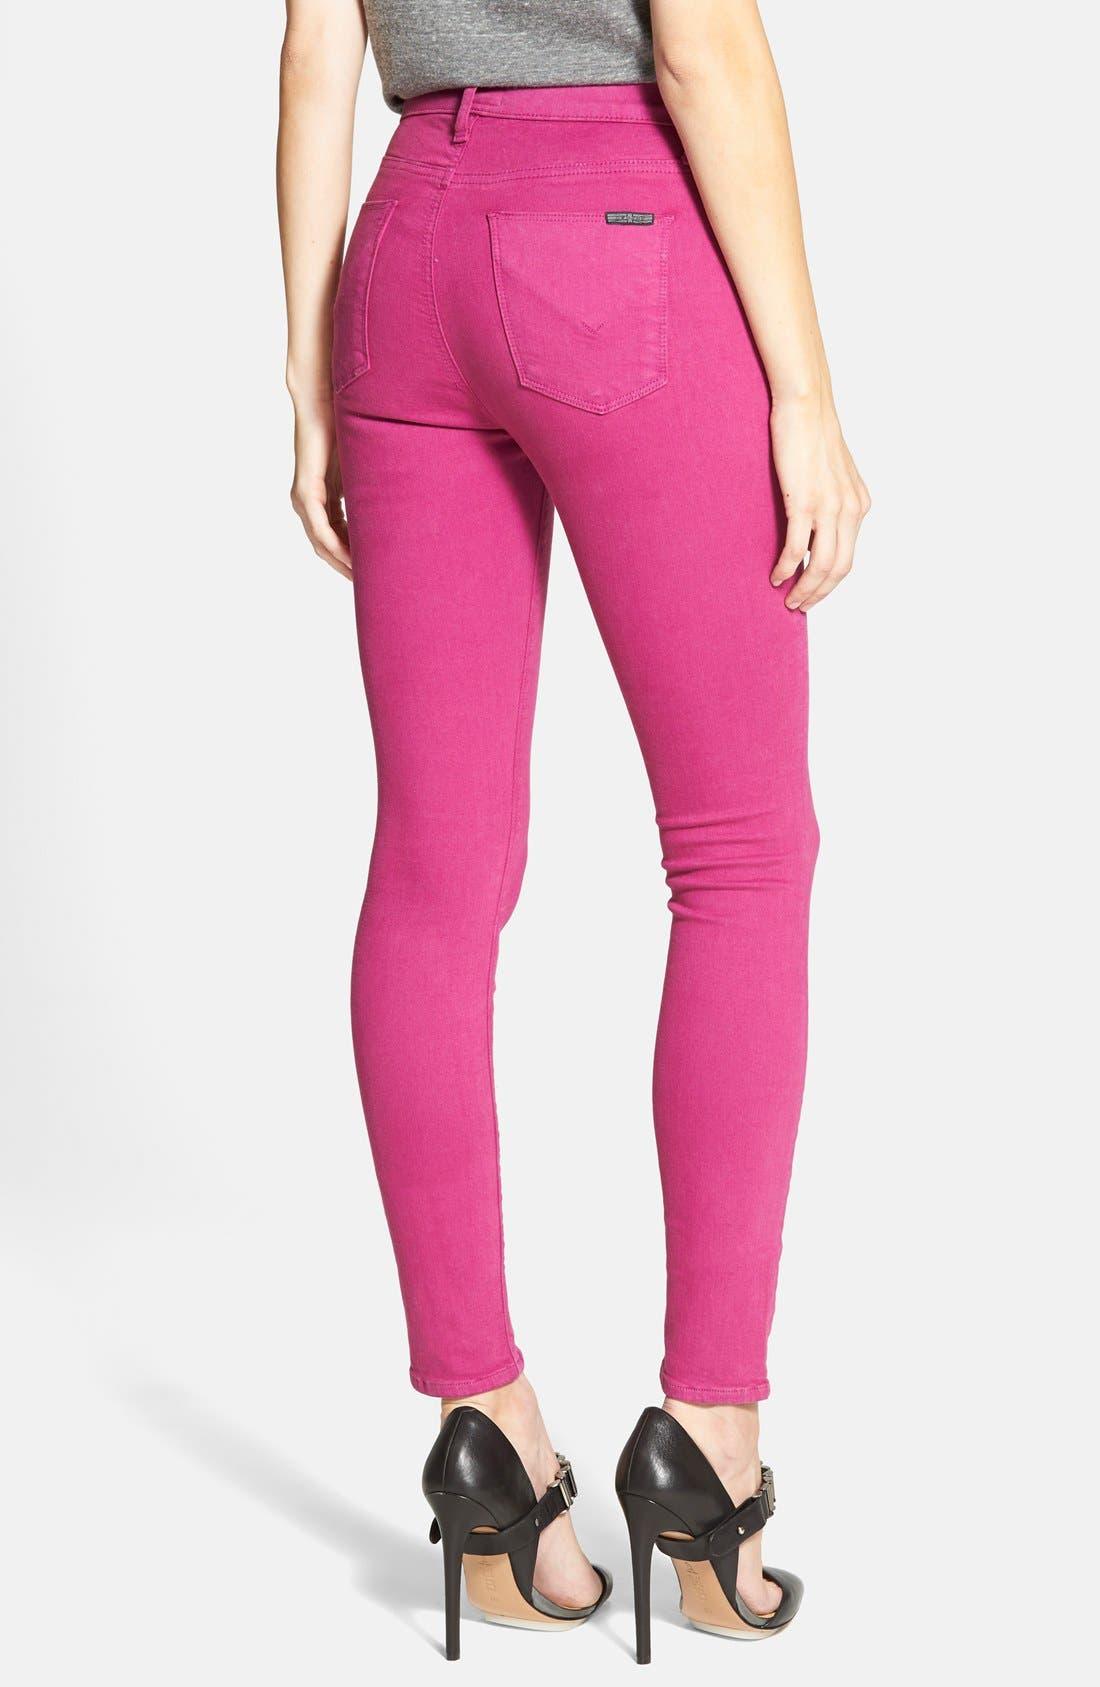 Alternate Image 2  - Hudson Jeans 'Krista' Super Skinny Jeans (Bright Hydrangea)